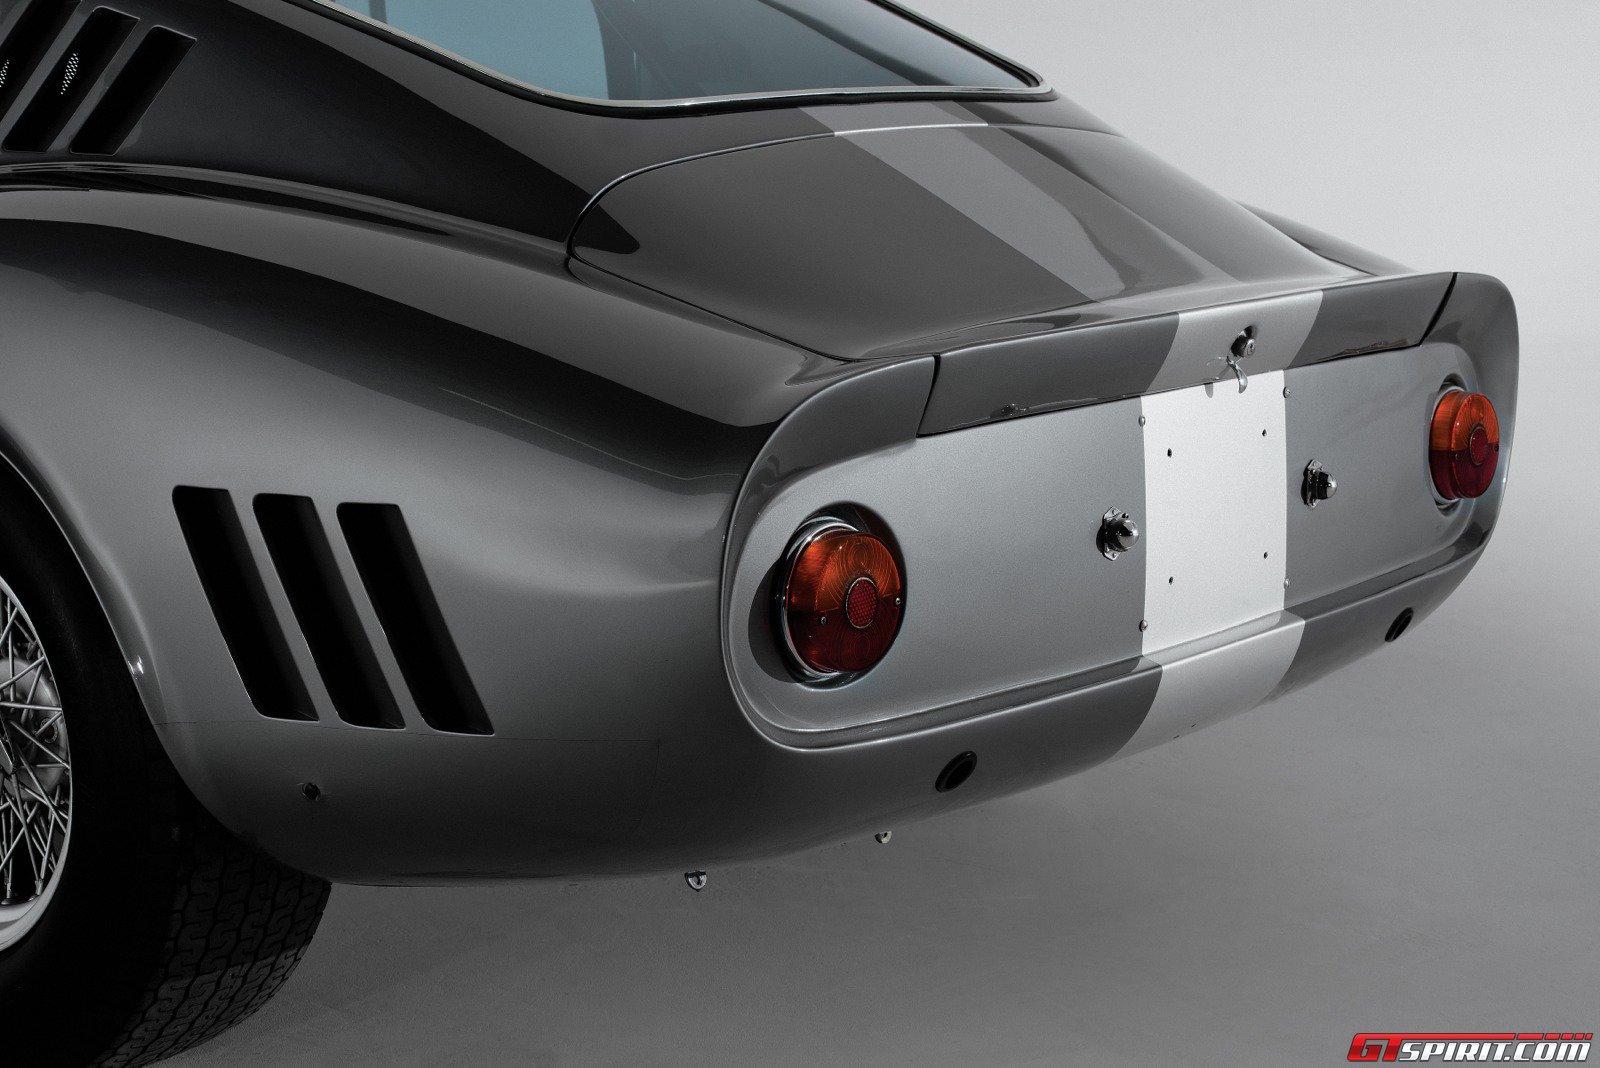 RM Auctions Announce Sale Of Ferrari 275 GTB/C Speciale By